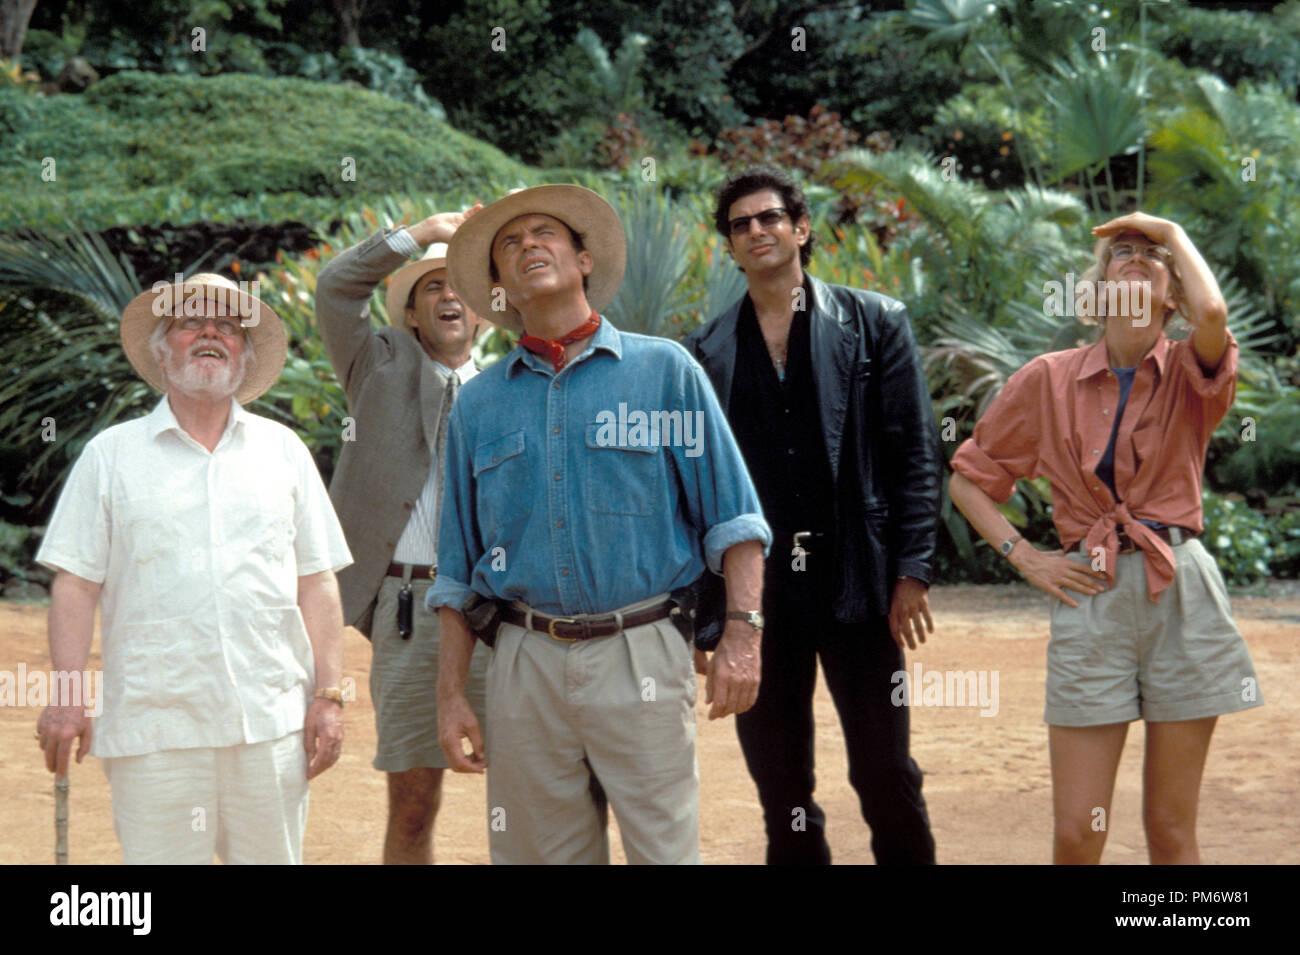 Film Still from 'Jurassic Park' Richard Attenborough, Martin Ferrero, Sam Neill, Jeff Goldblum, Laura Dern © 1993 Universal Photo Credit: Murray Close - Stock Image